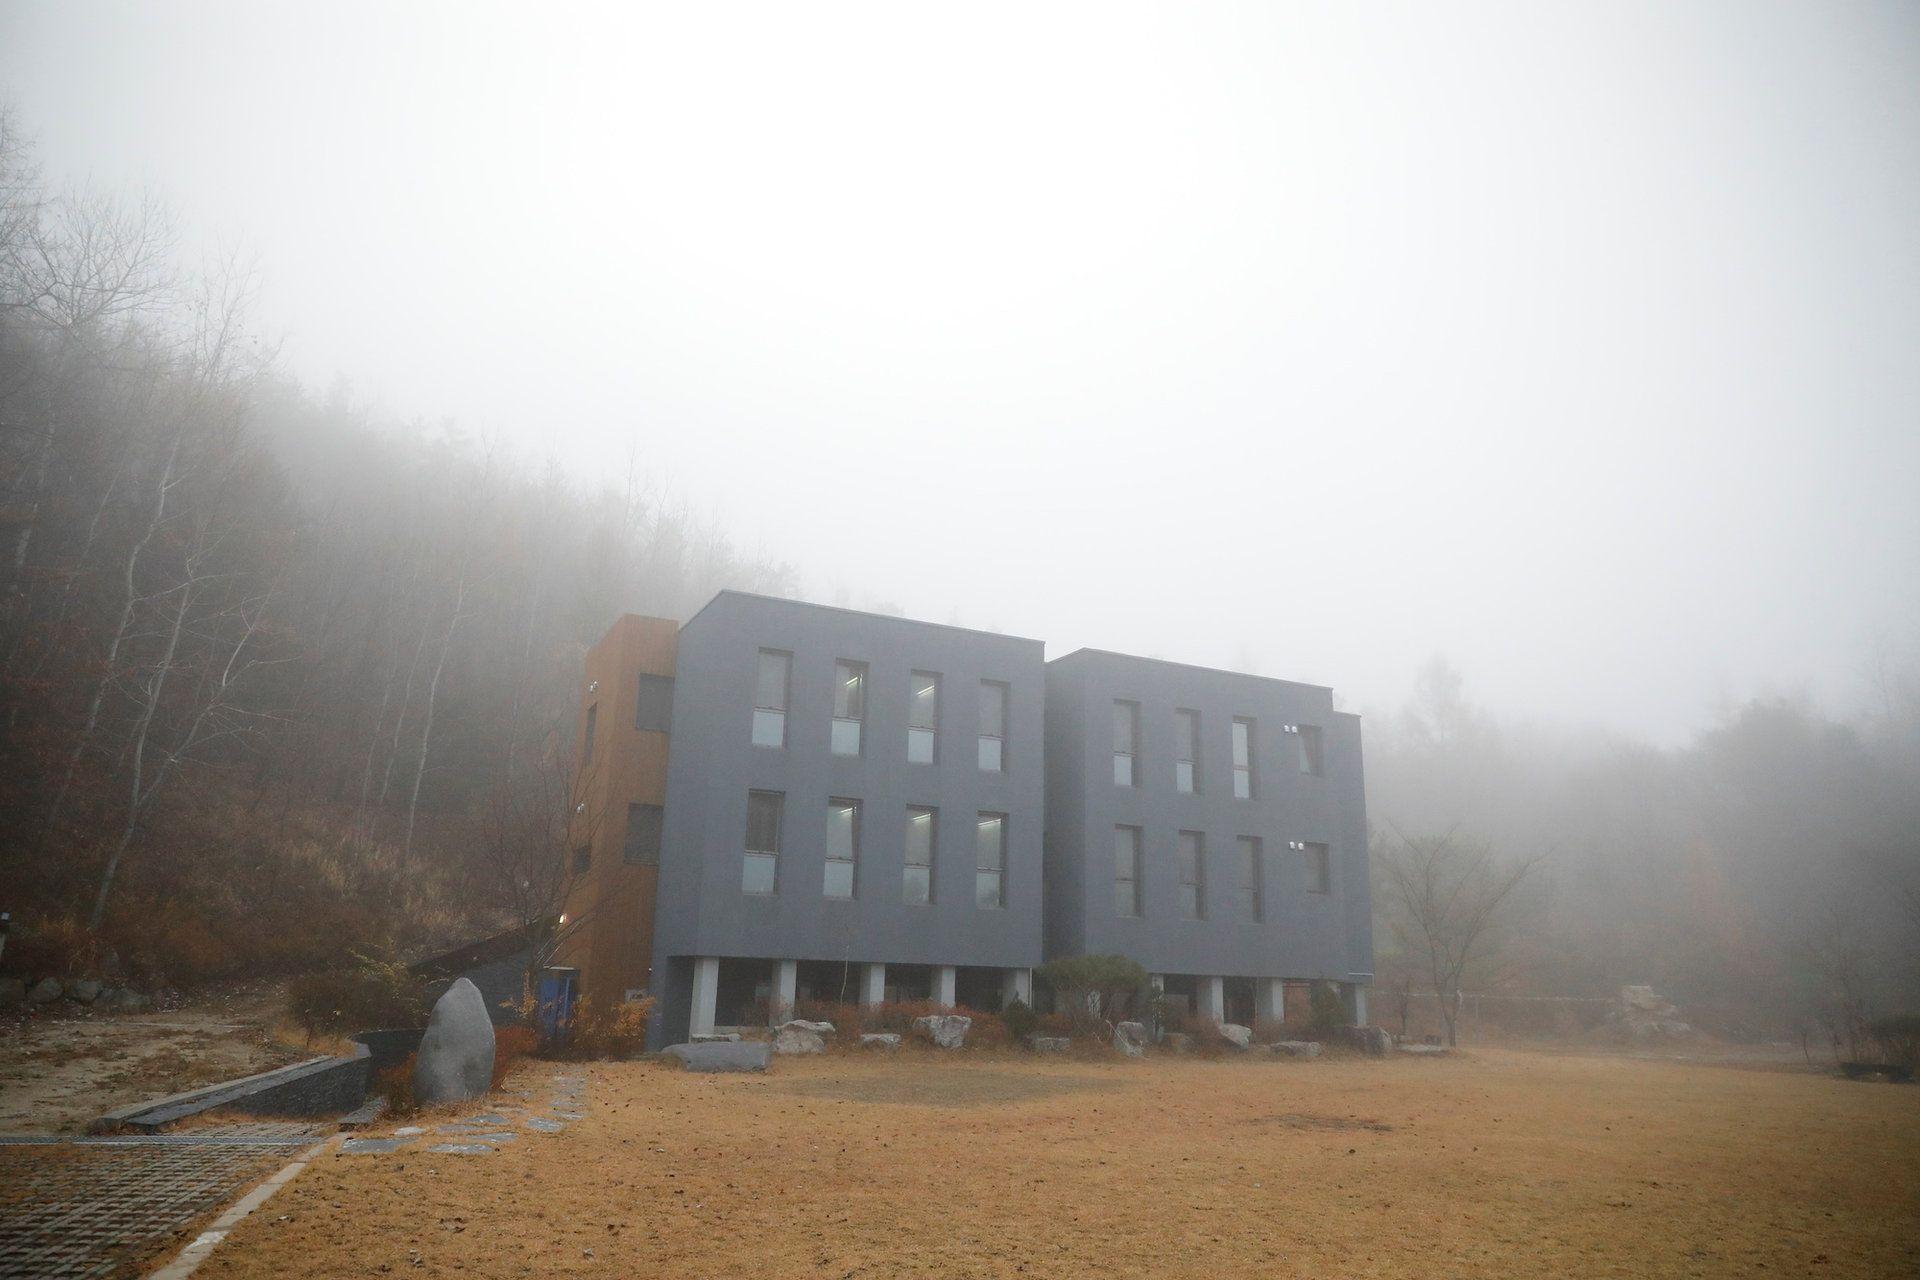 【ELLE怪奇物語】花錢入住「模擬監獄」你願意嗎?韓國的「牢房住宿」熱潮背後,是一群想逃離生活喧囂的城市人